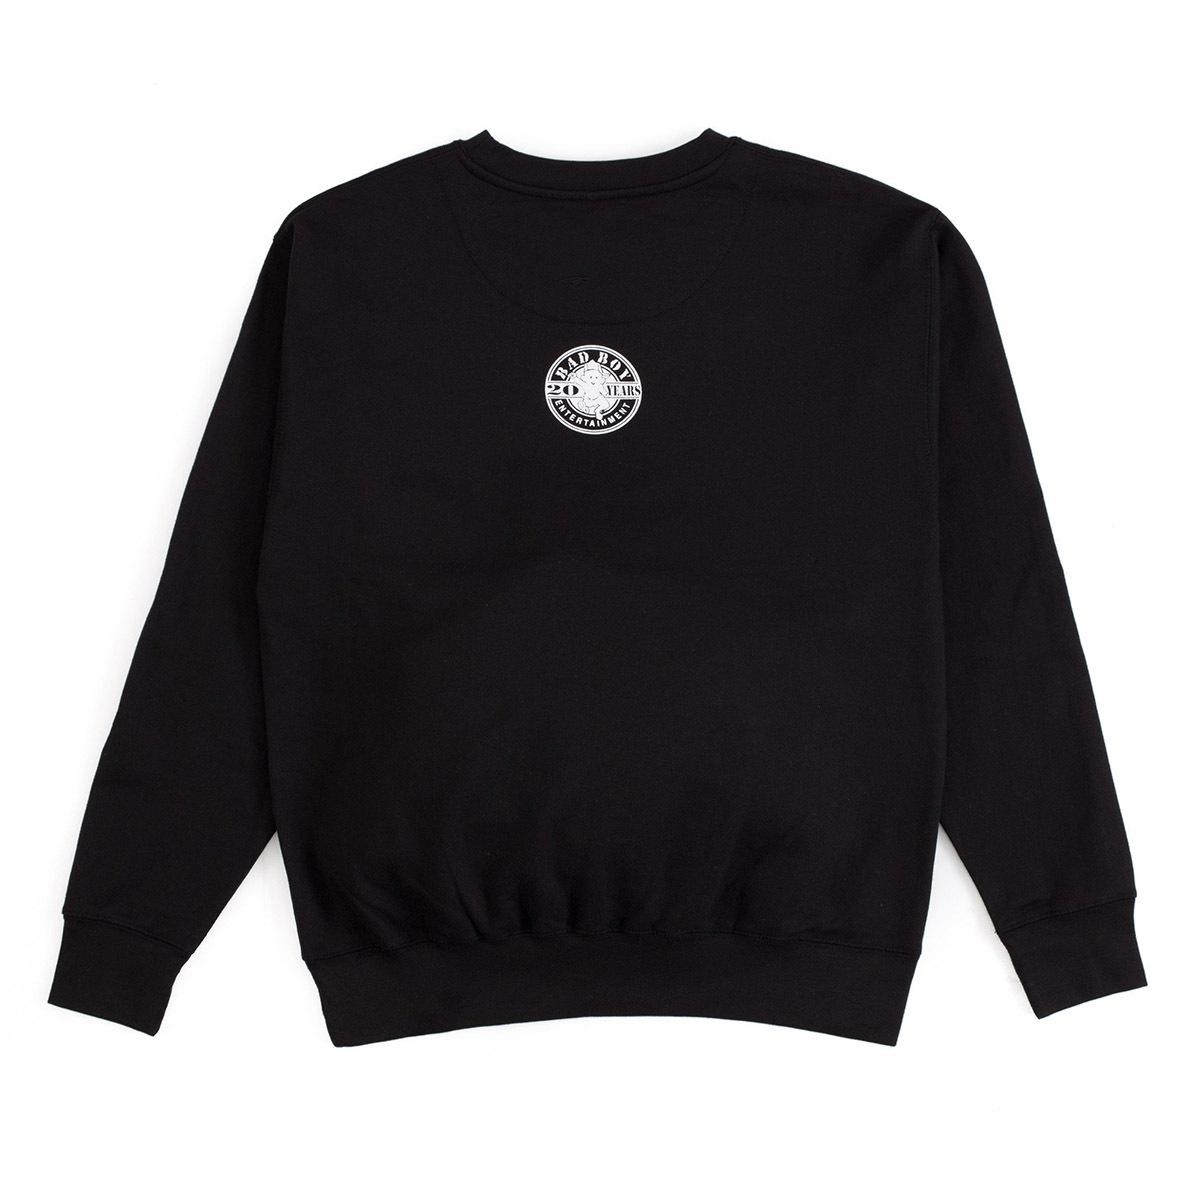 Bad Boy Family Olde English Crewneck Sweatshirt